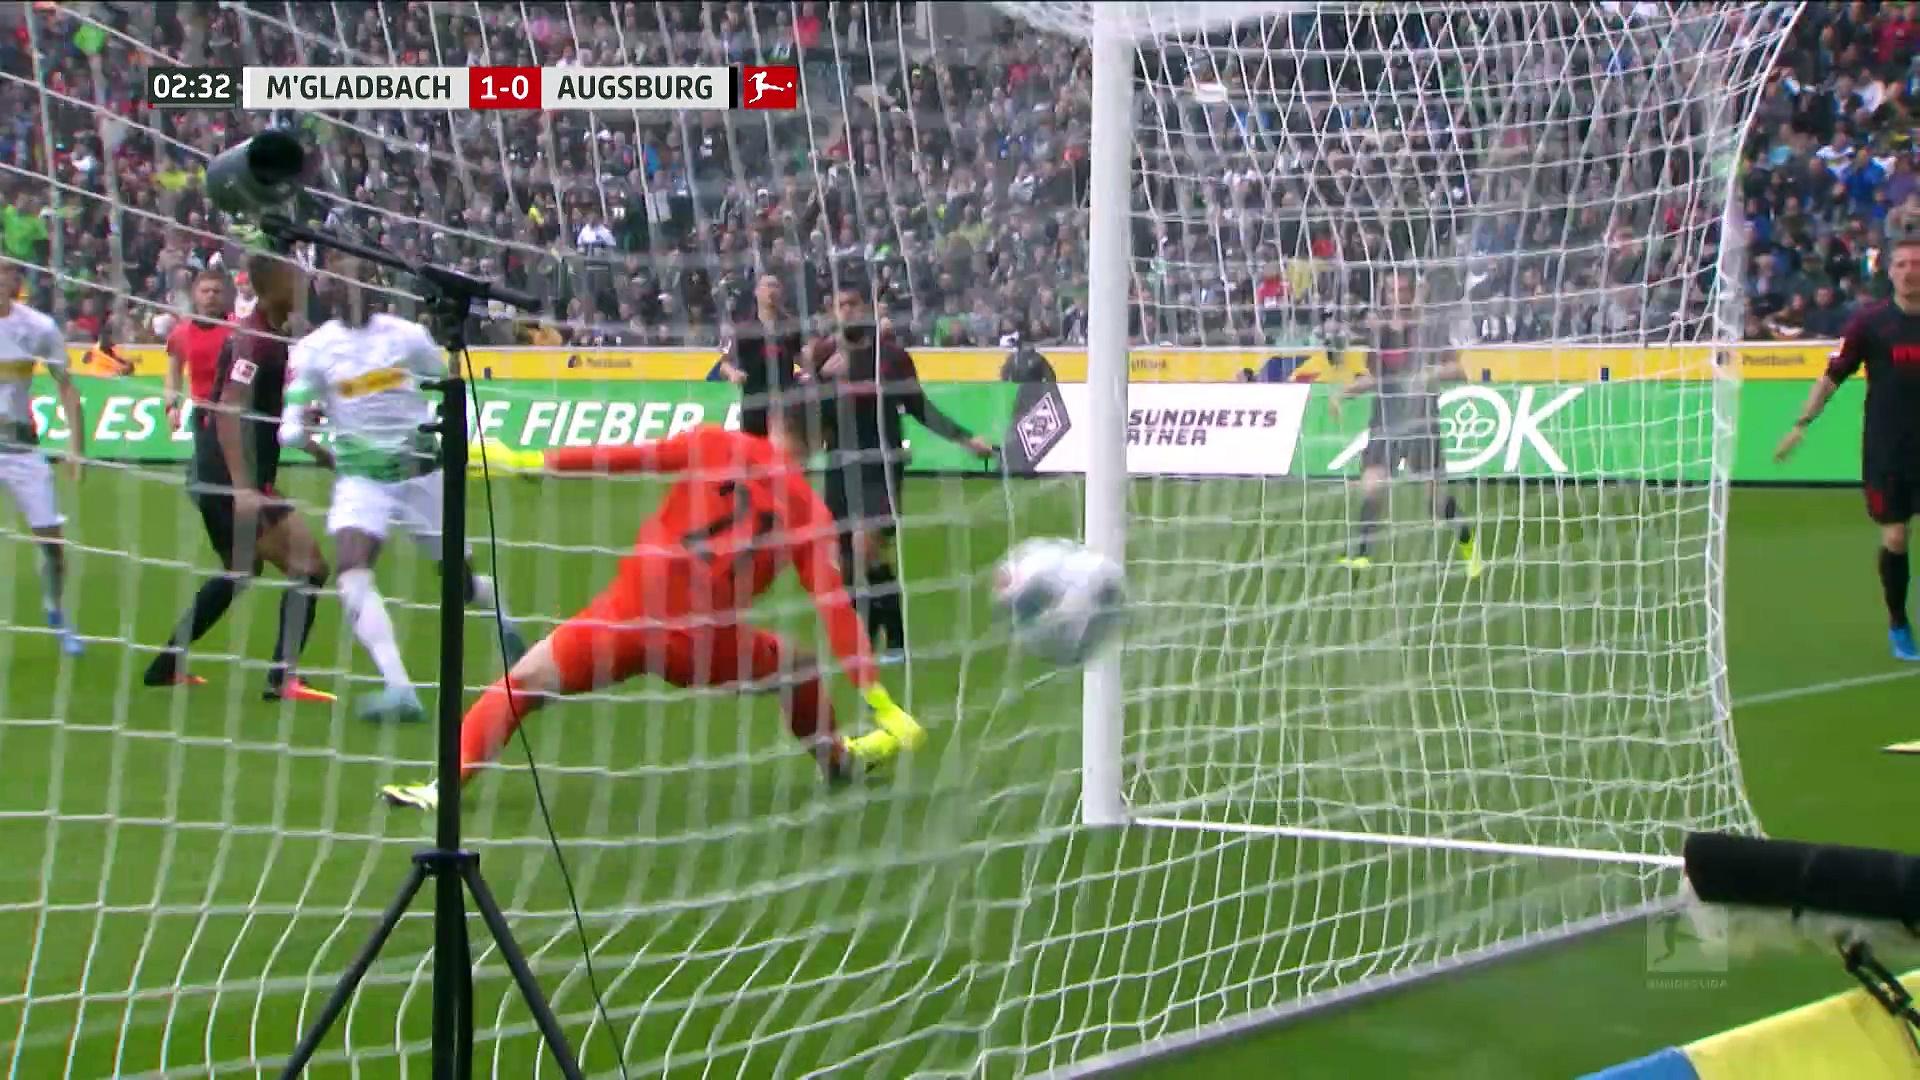 7. Hafta / M'Gladbach - Augsburg: 5-1 (Özet)